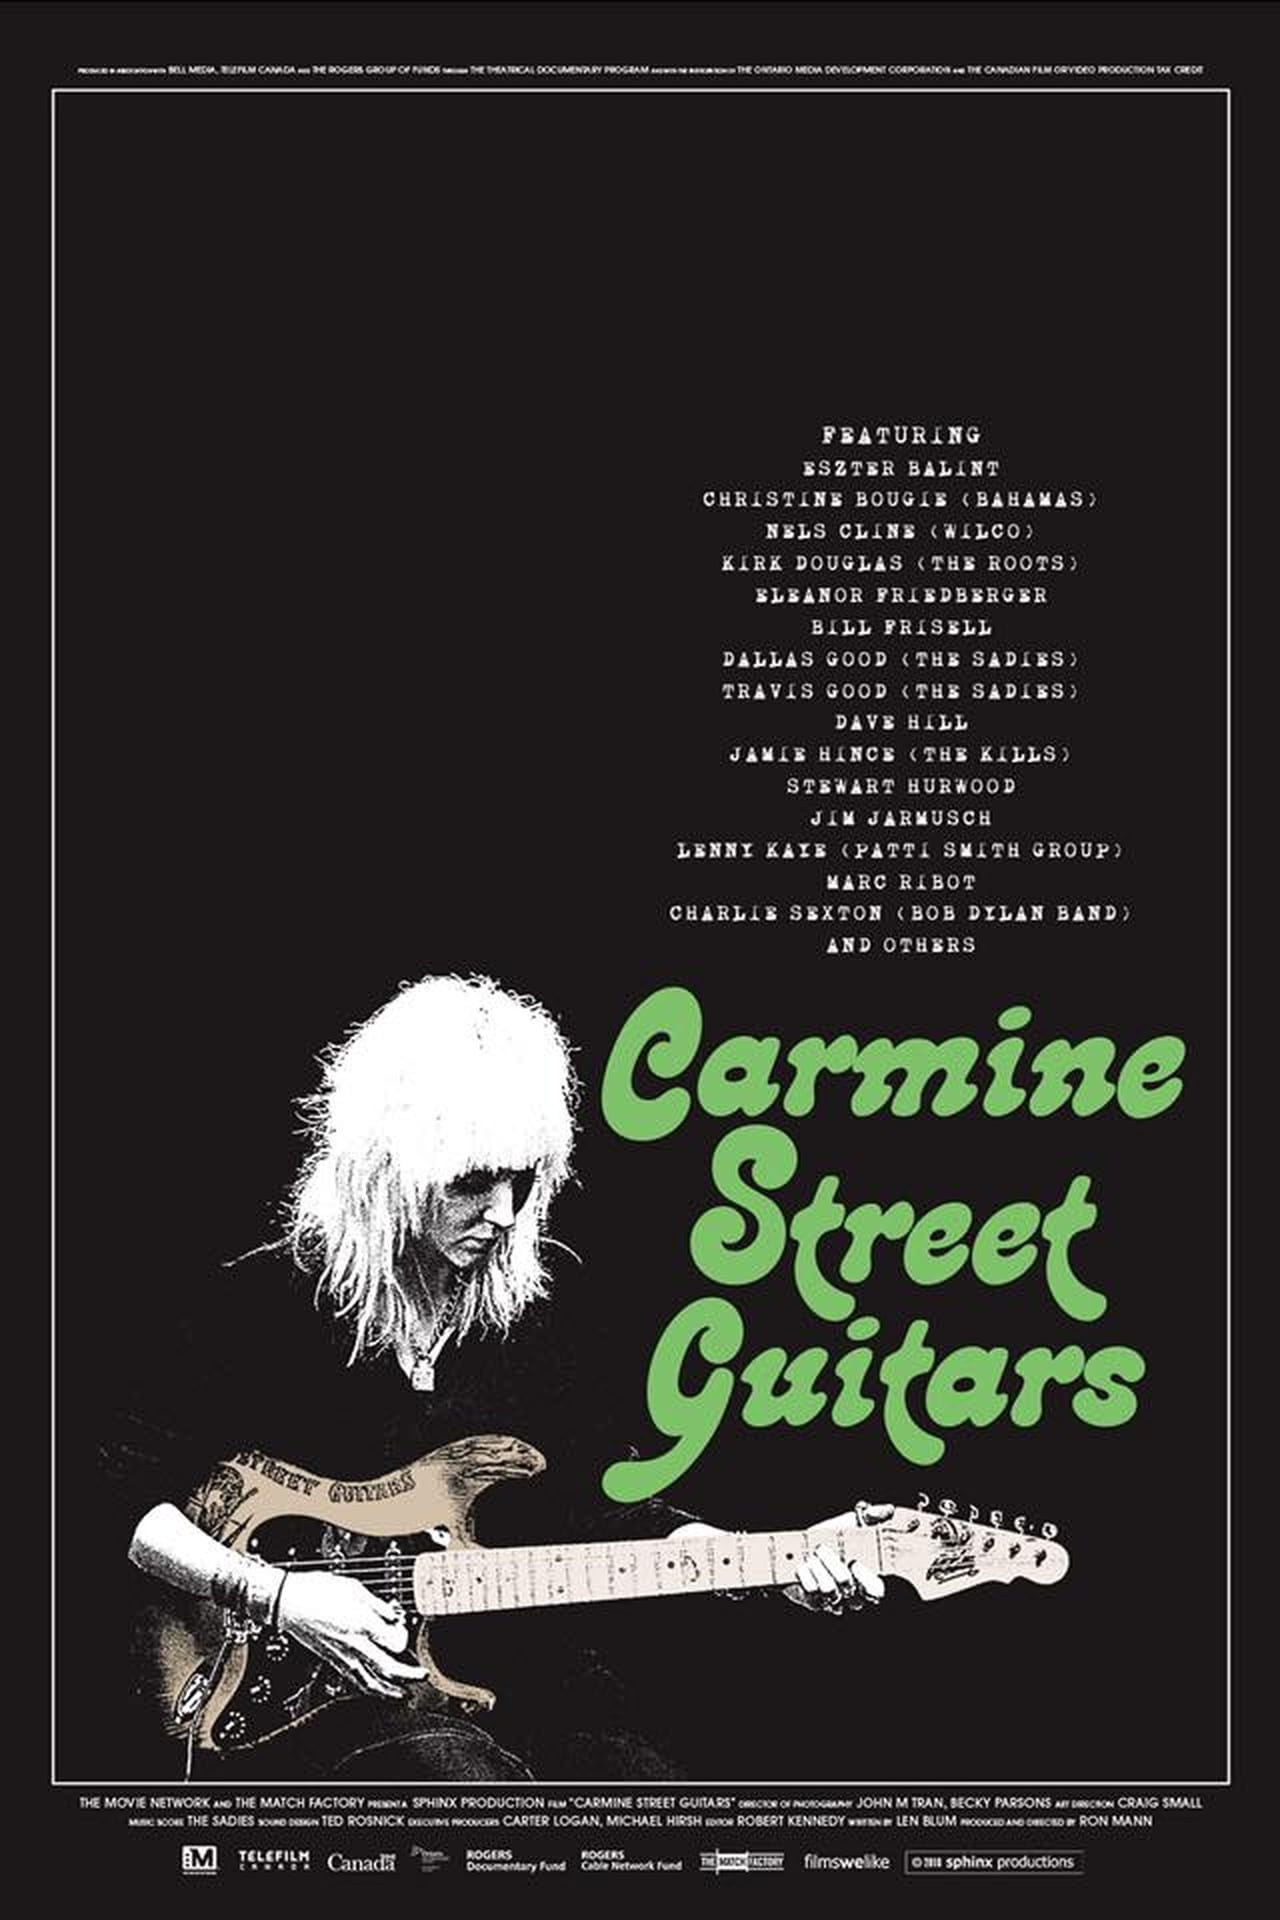 Carmine Street Guitars